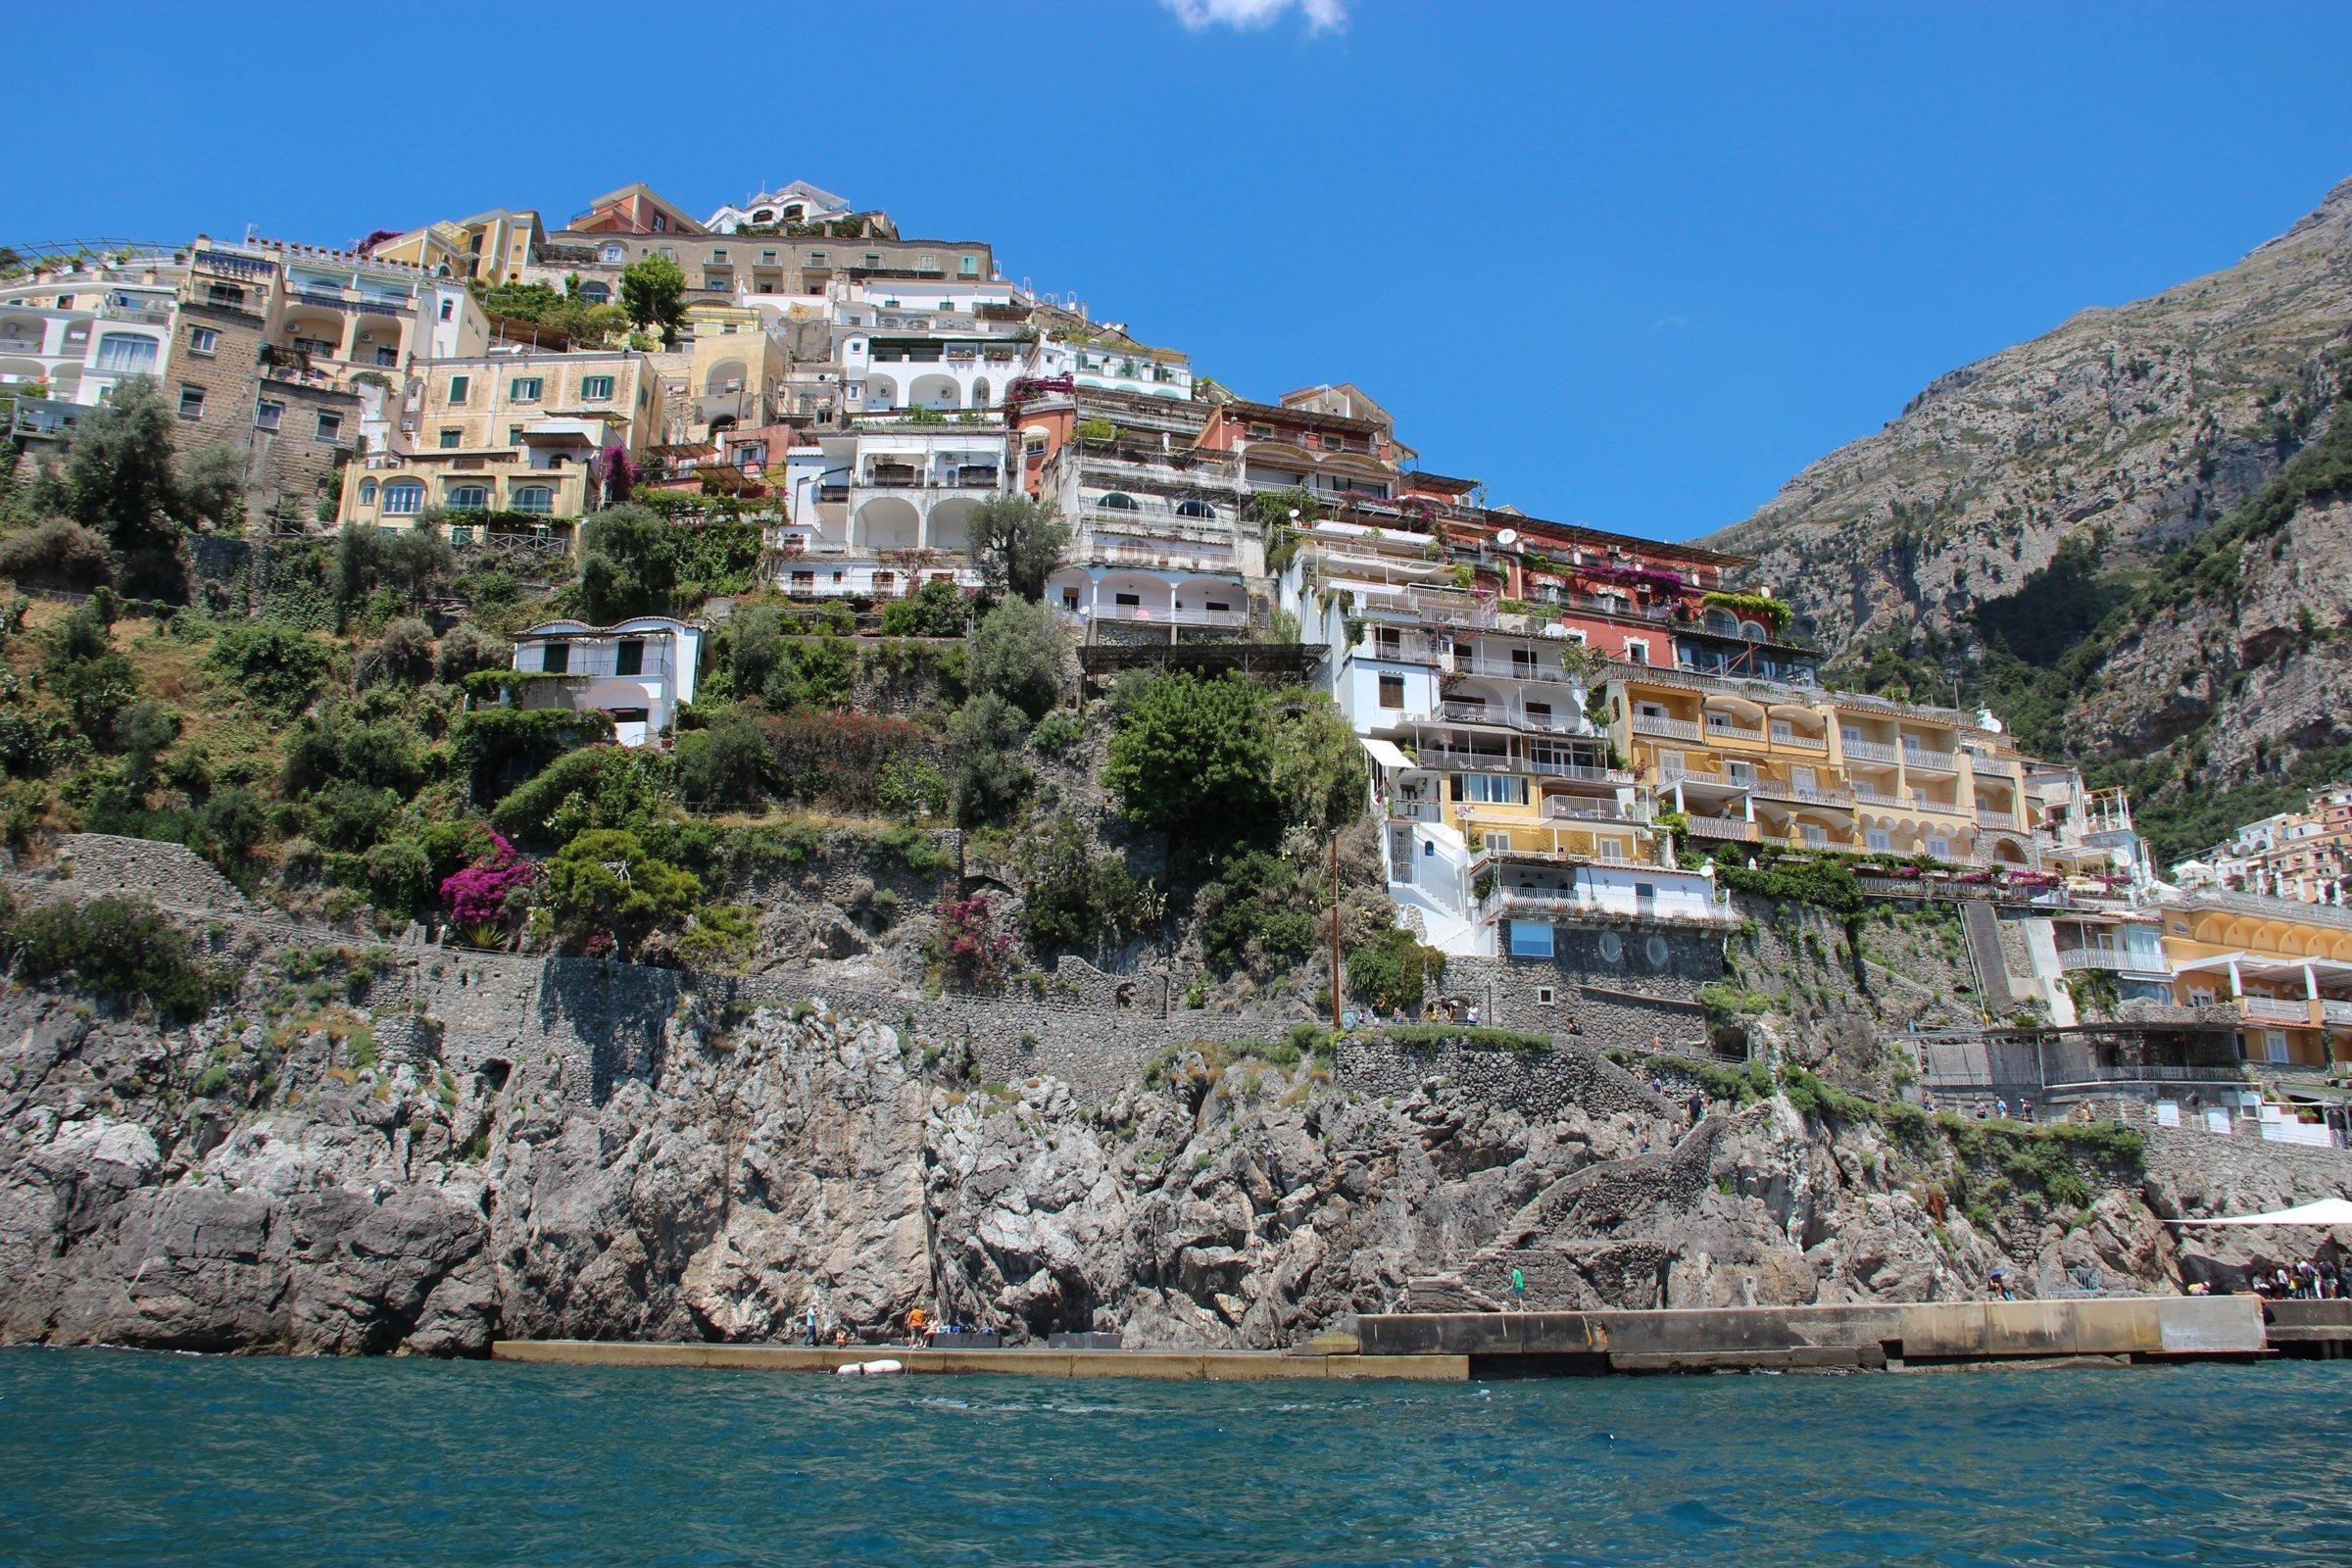 Buildings On Coastal Cliff